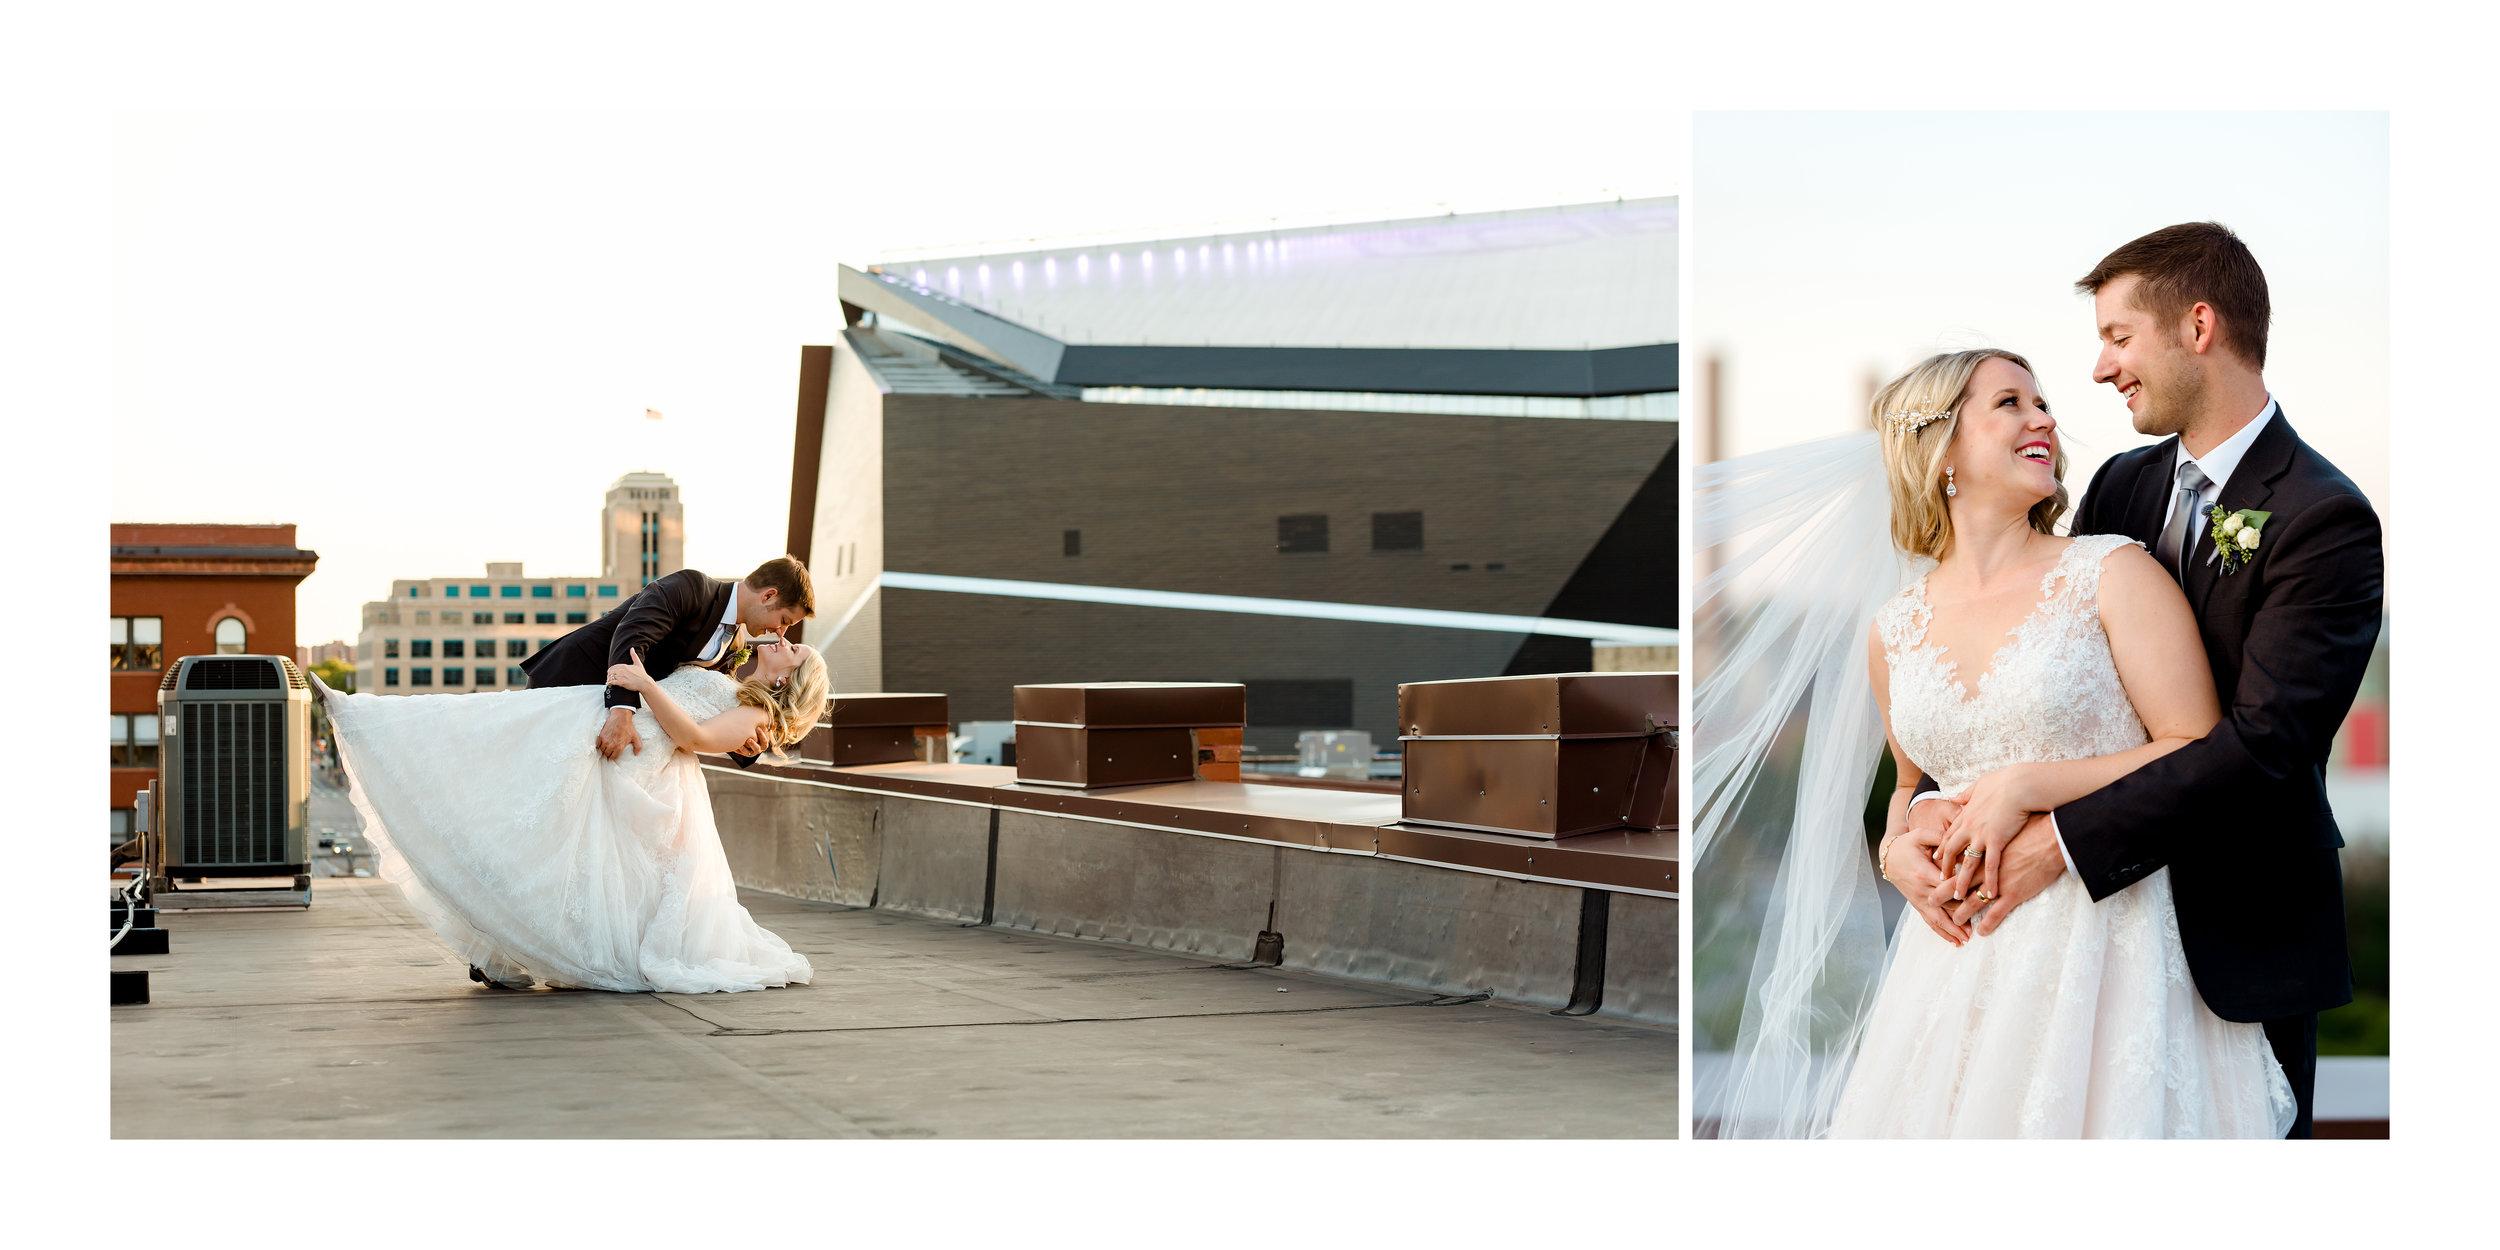 Kristen + Eric - Wedding Album Sample_02.jpg